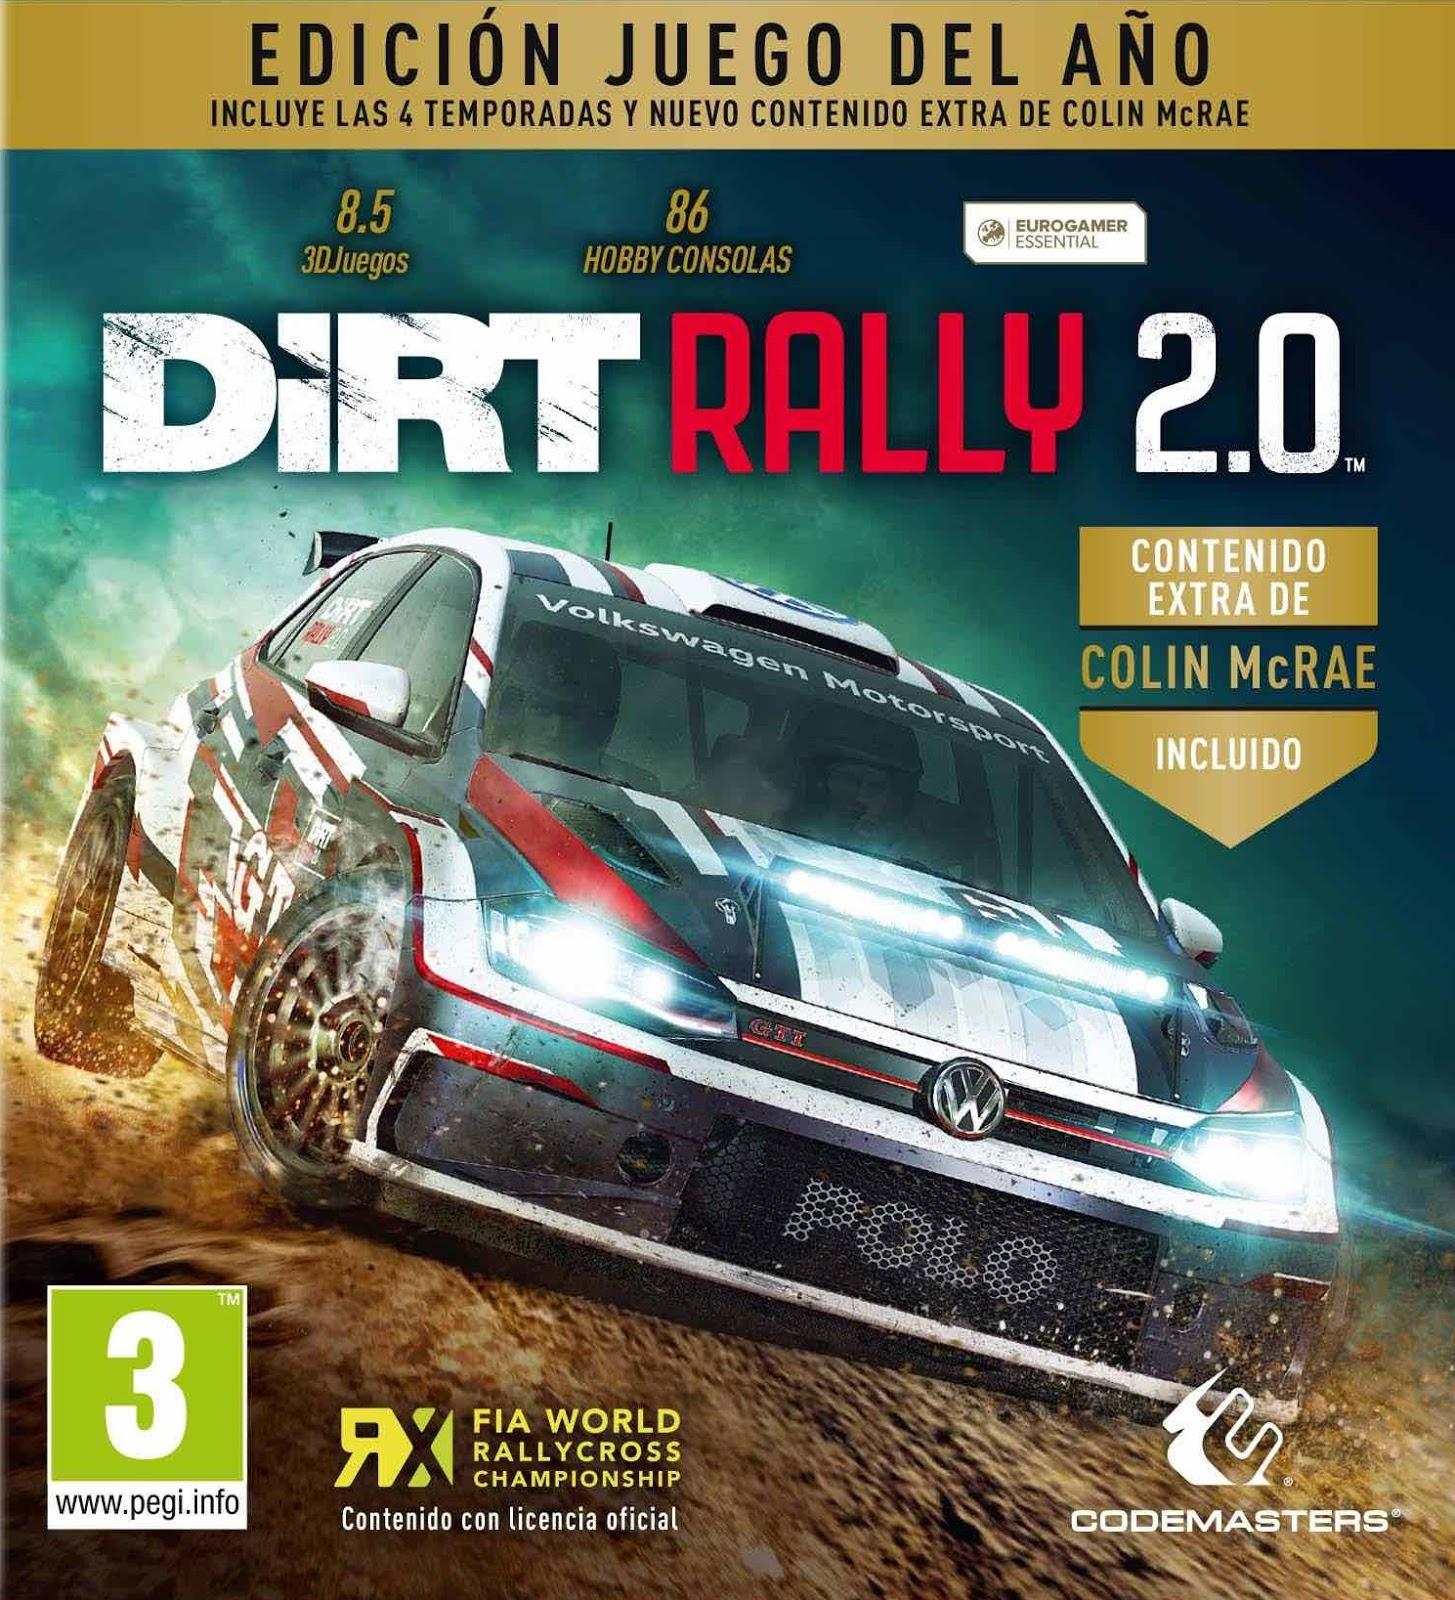 DiRT Rally 2.0 PC Cover Caratula-www.juegosparawindows.com